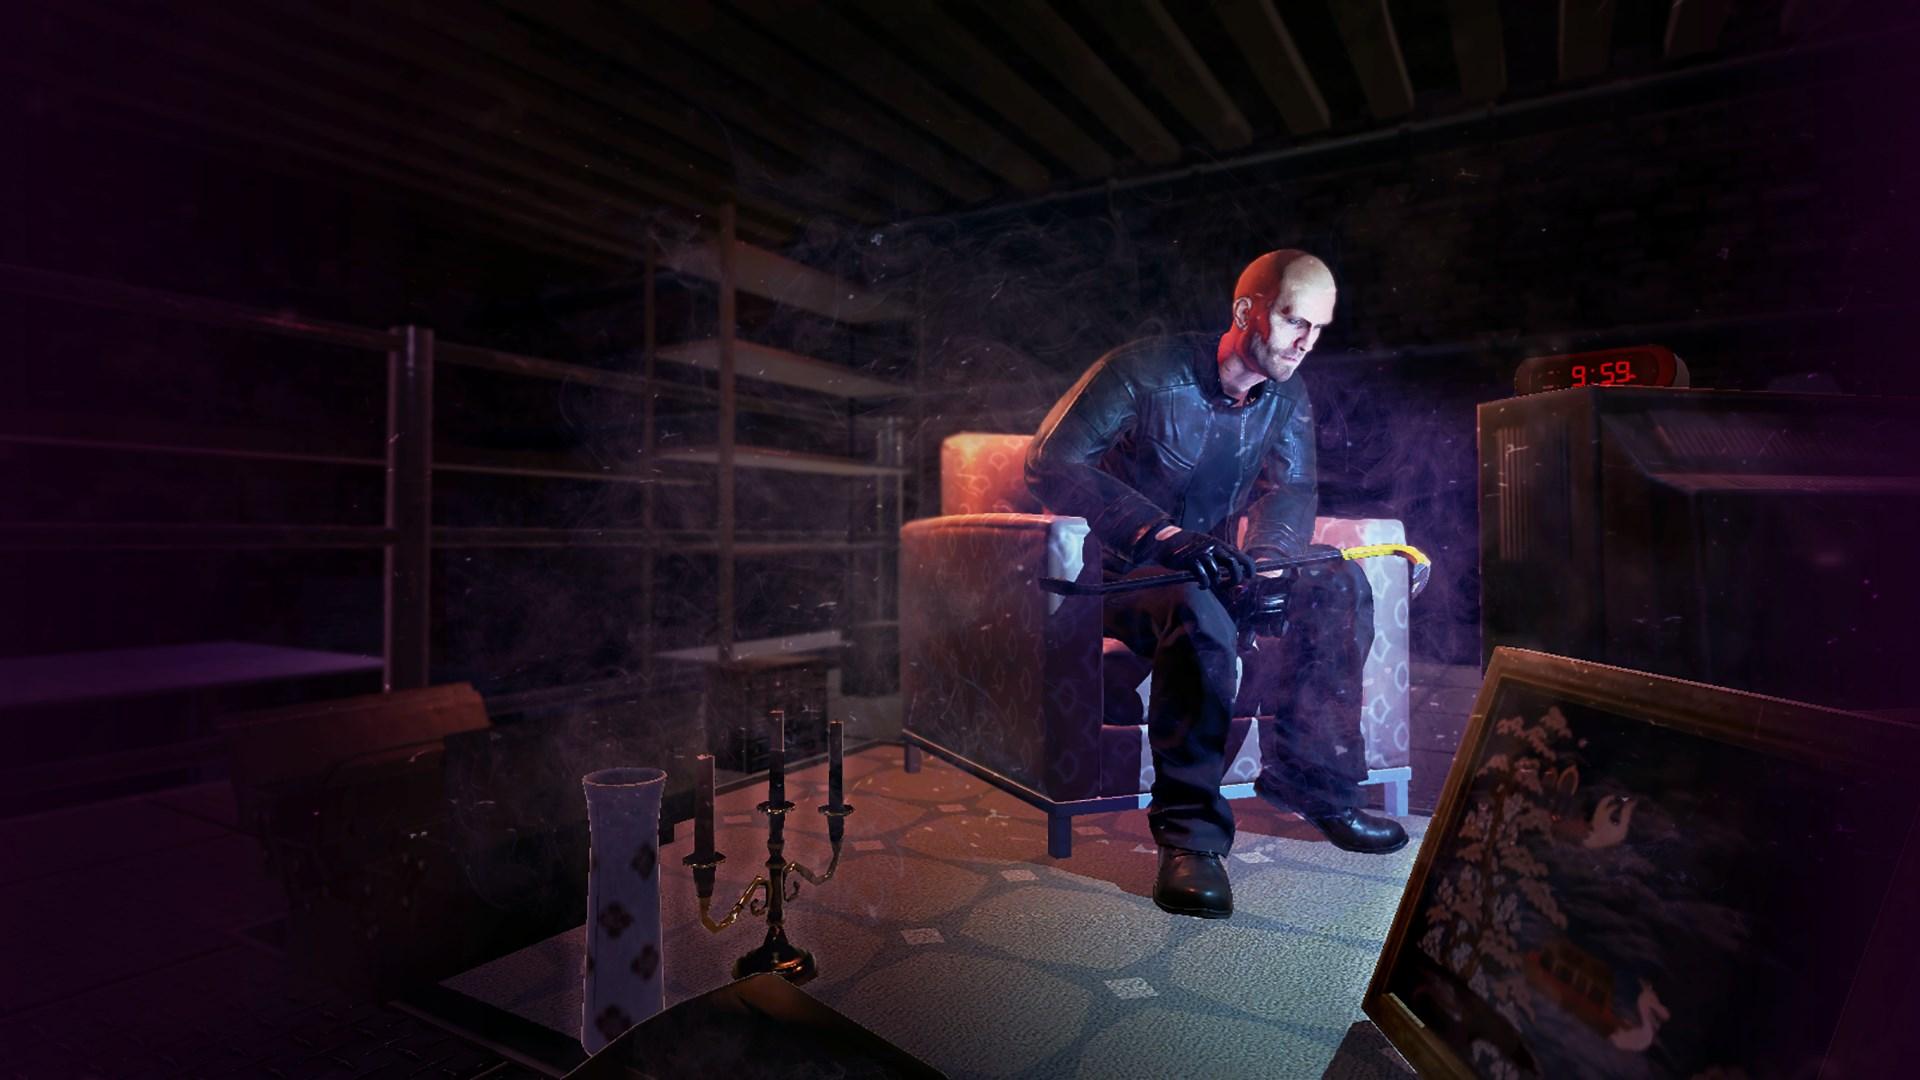 Buy Thief Simulator - Microsoft Store en-IN